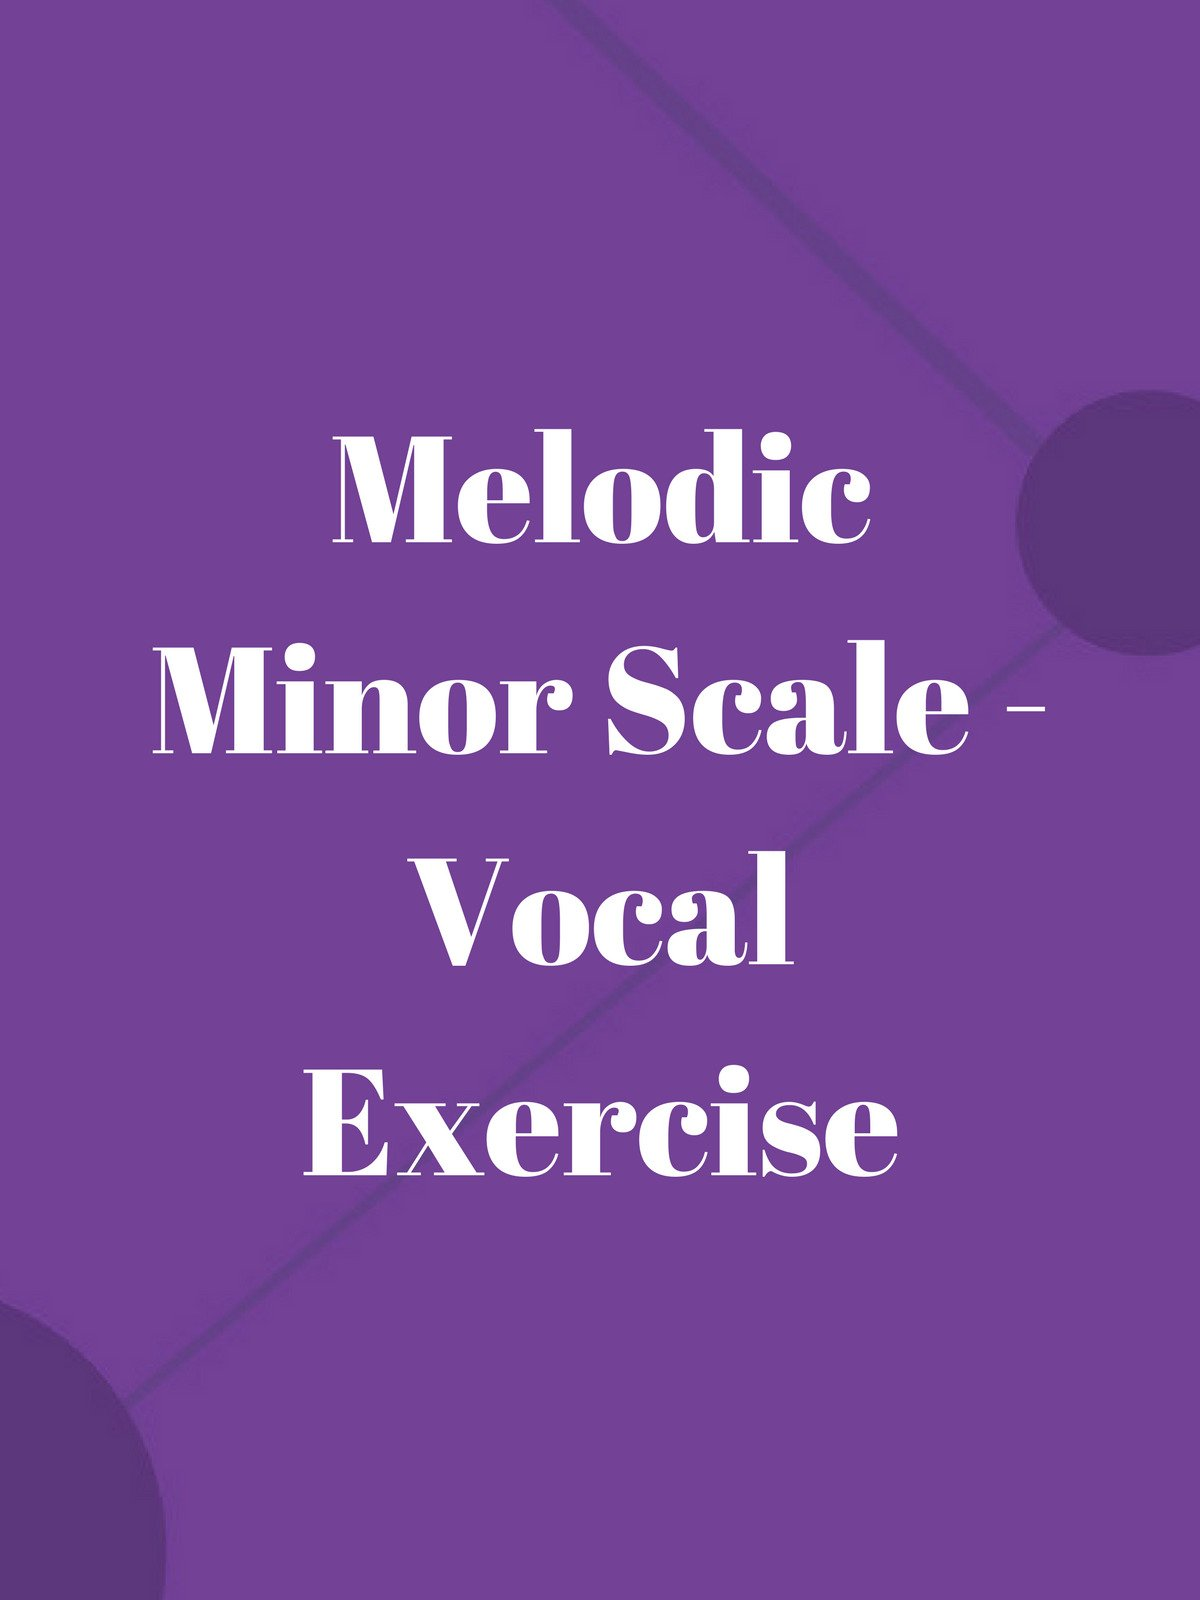 Melodic Minor Scale on Amazon Prime Video UK